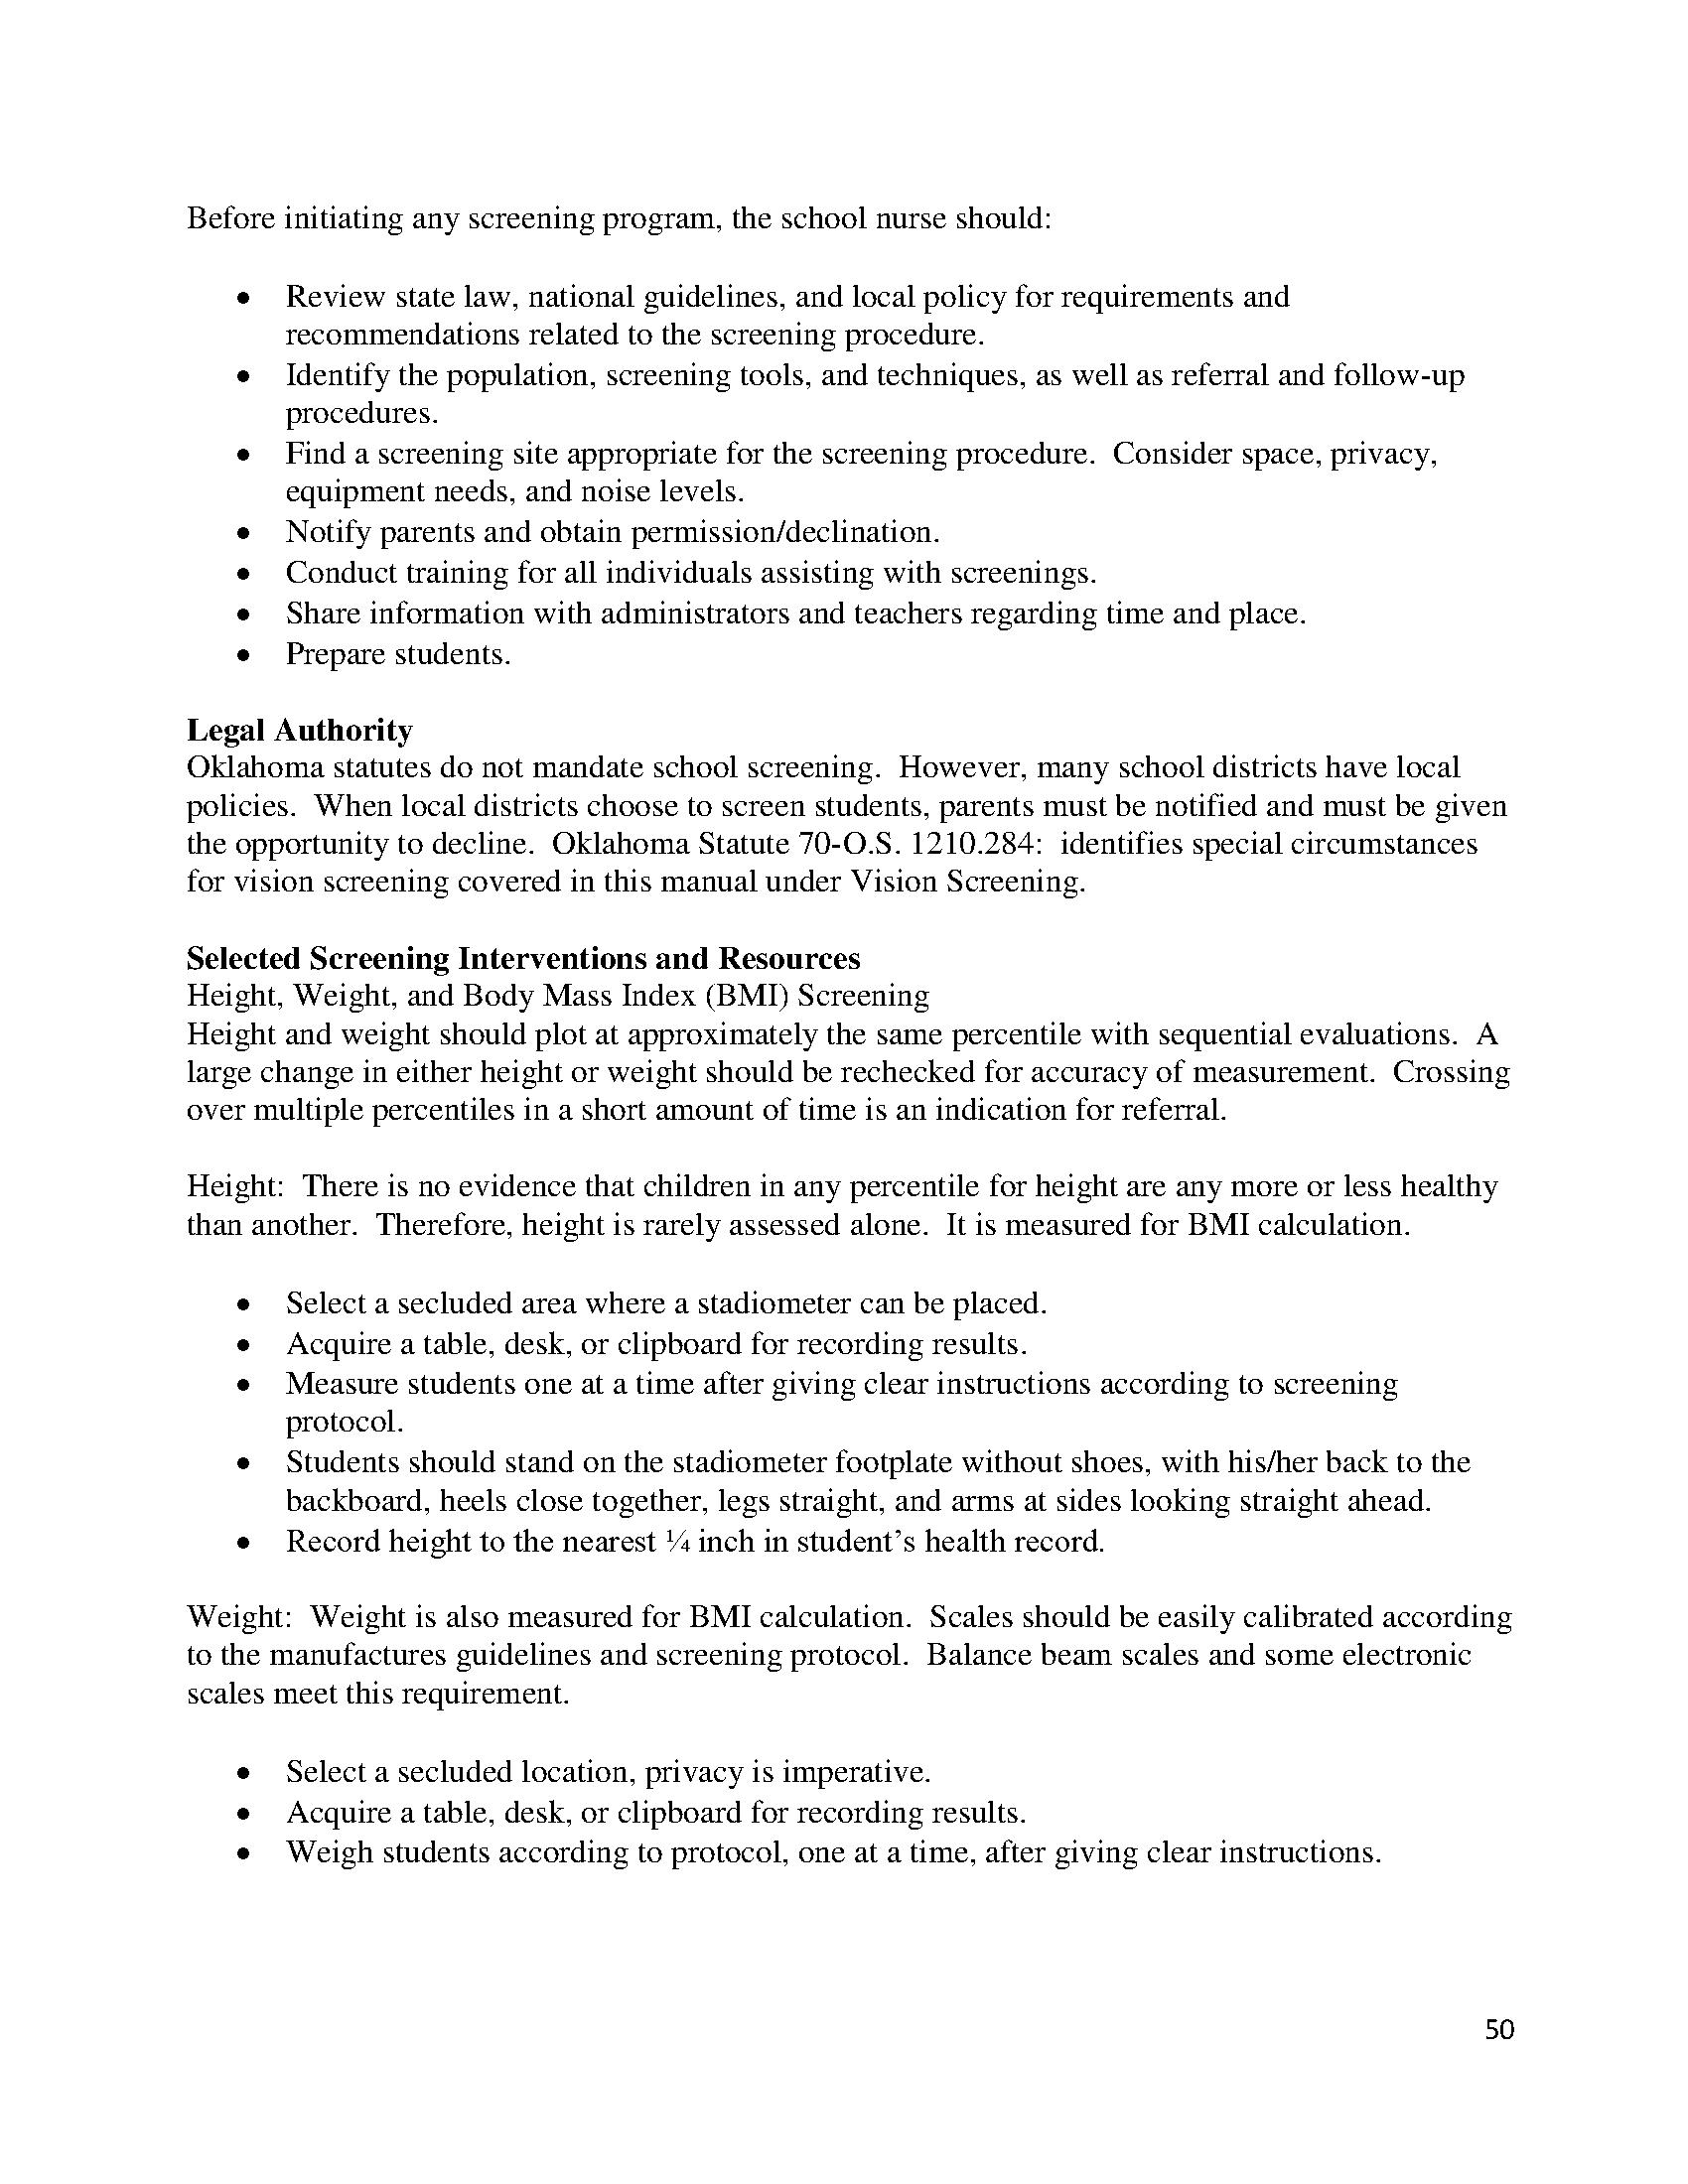 Oklahoma School Nurse Guidelines and Example IHSP 52 - Documents OK